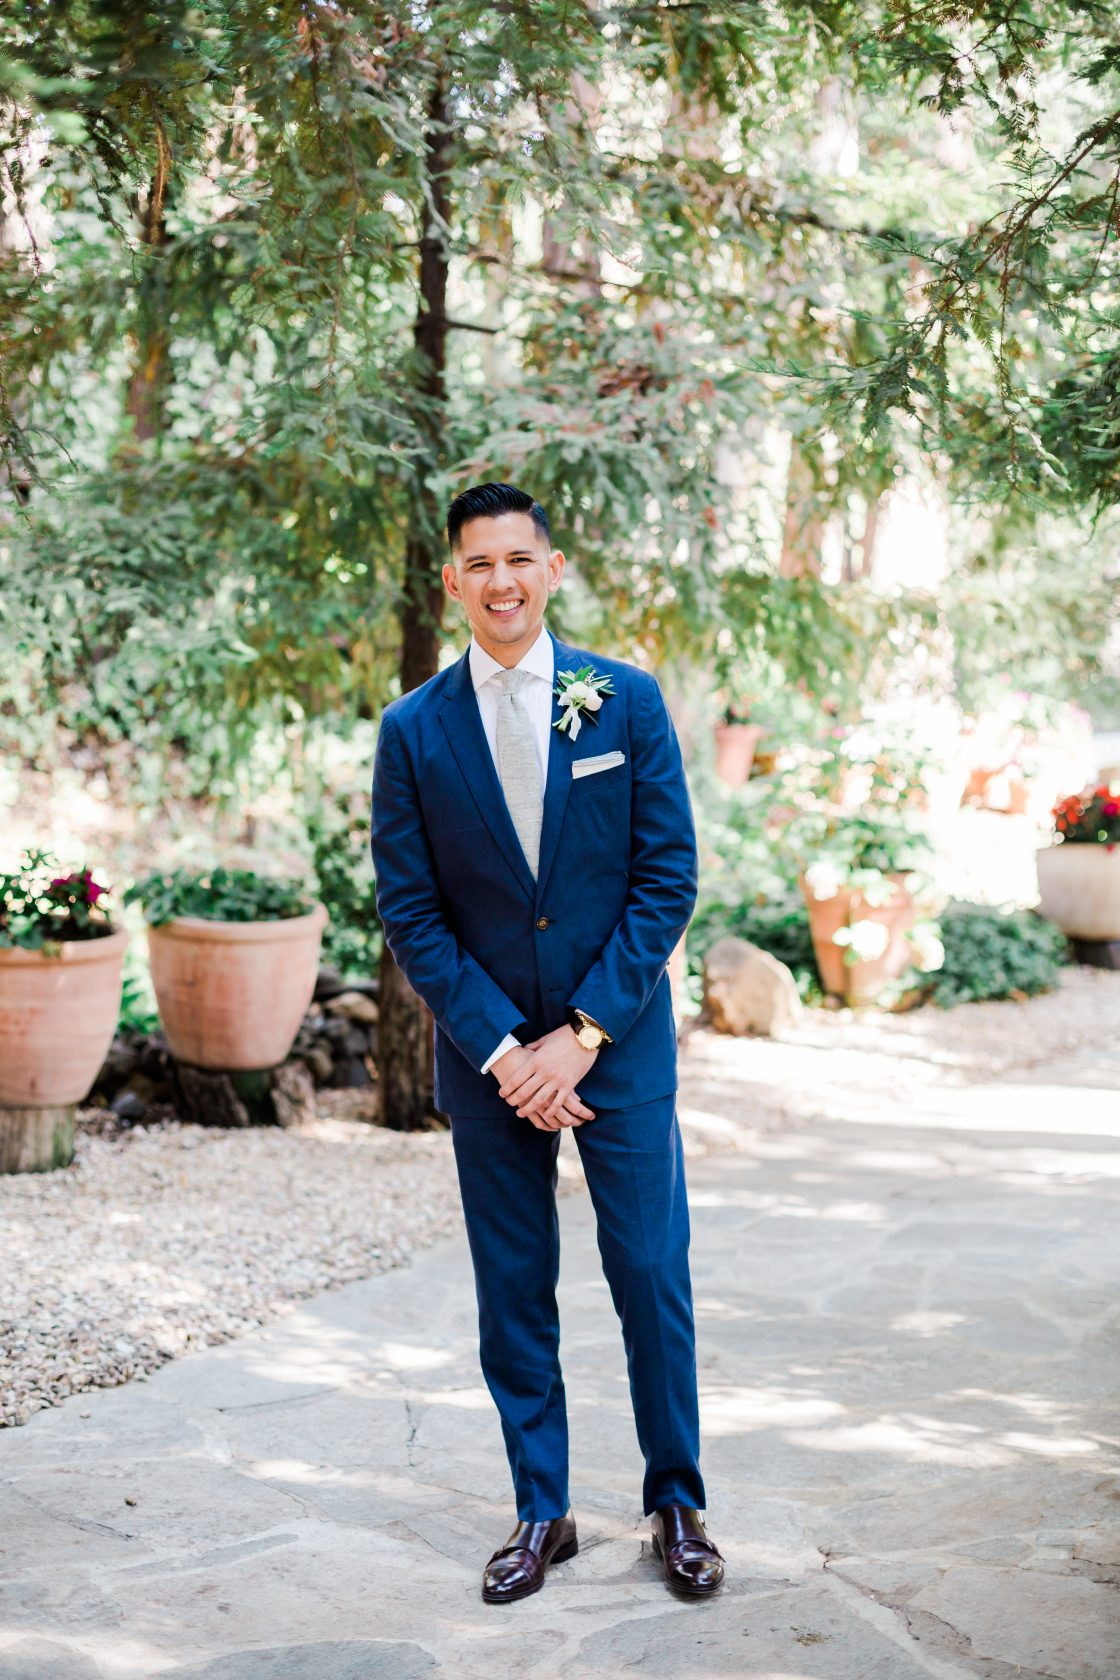 Calamigos Ranch Wedding_Valorie Darling Photography_020B6128